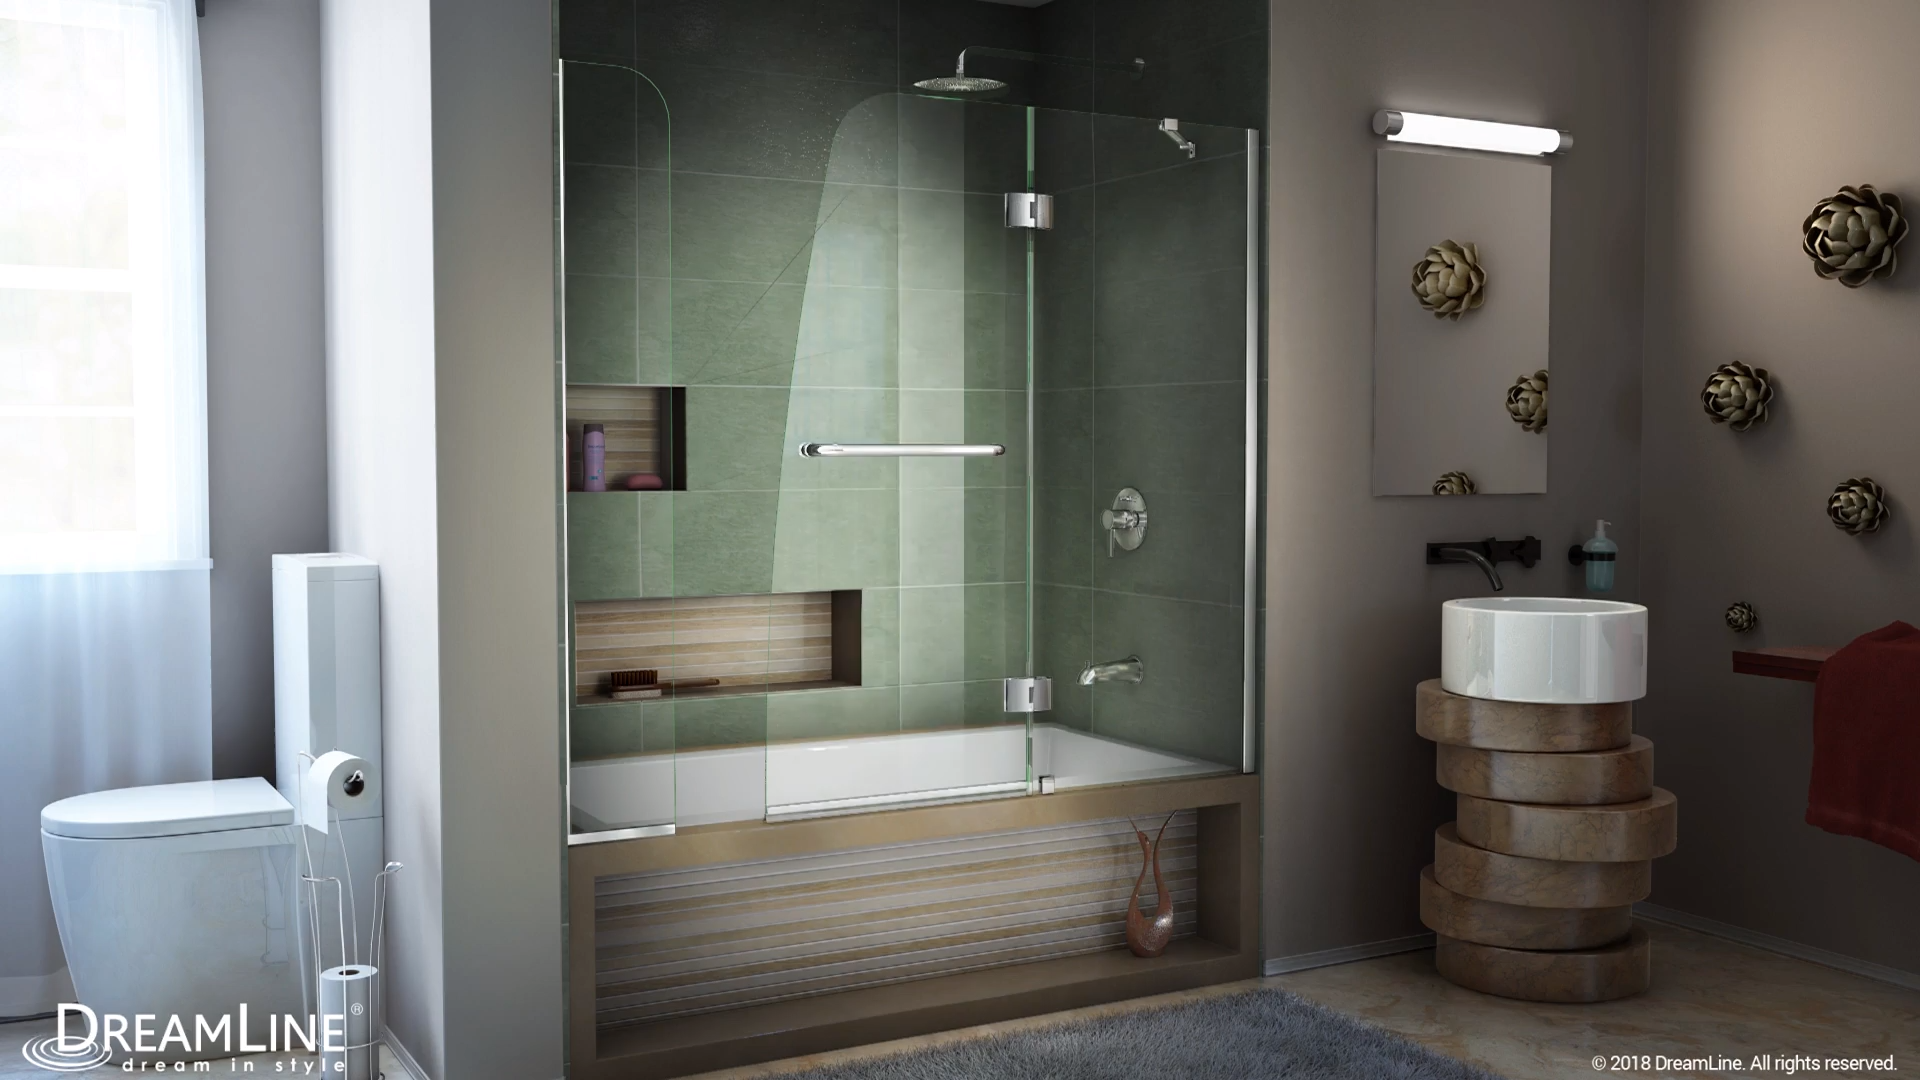 Dreamline Aqua Frameless Hinged Tub Door Video In 2020 Bathroom Design Luxury Bathroom Interior Design Small Bathroom Remodel